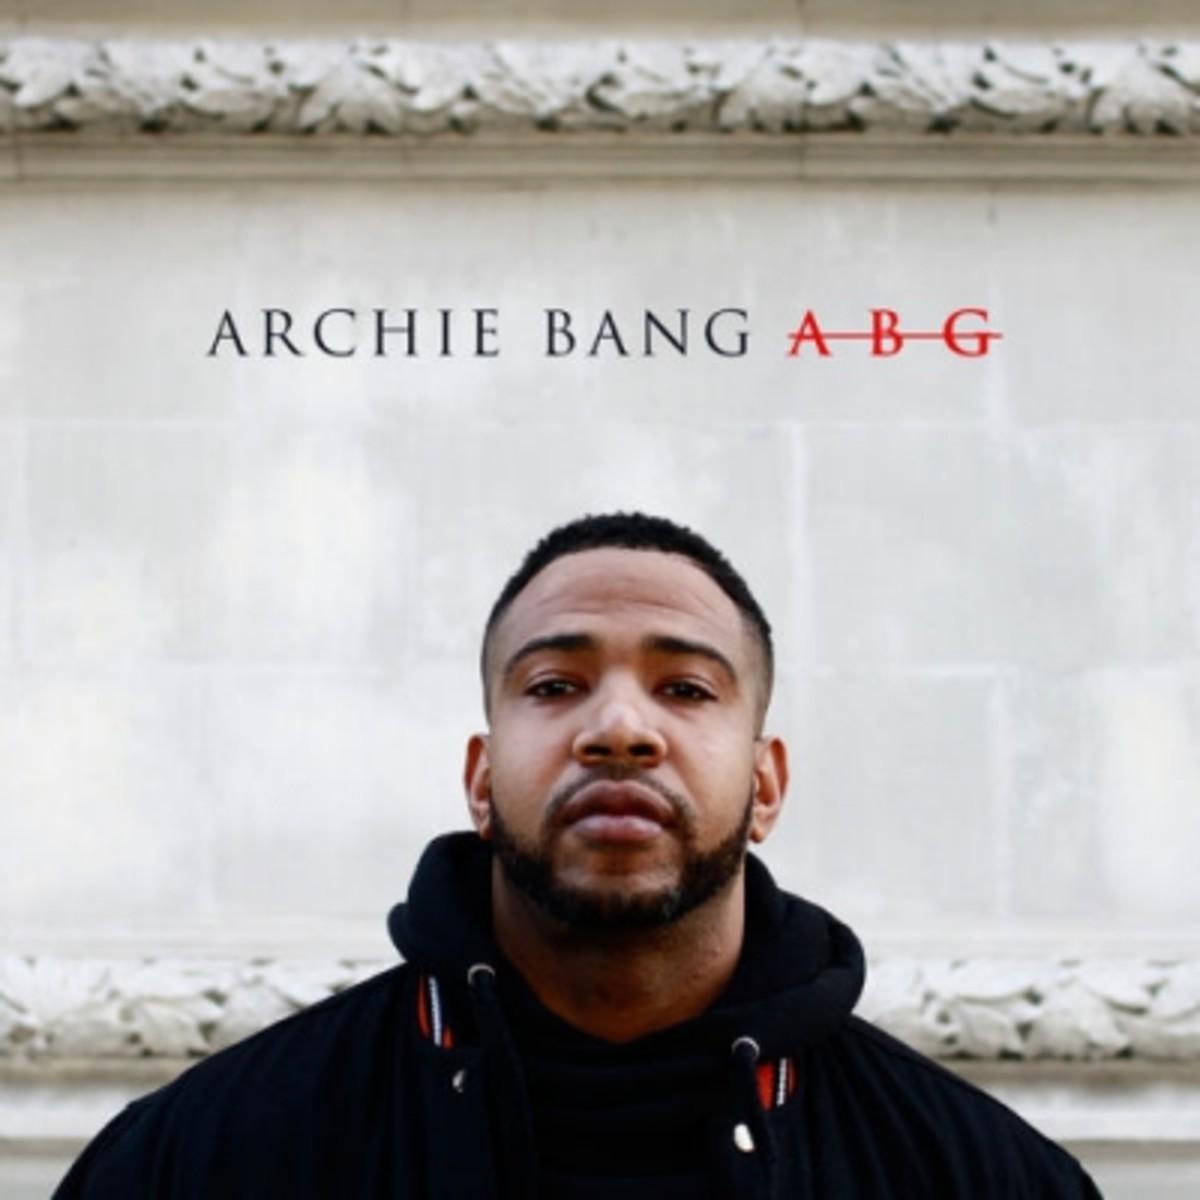 archie-bang-abg.jpg